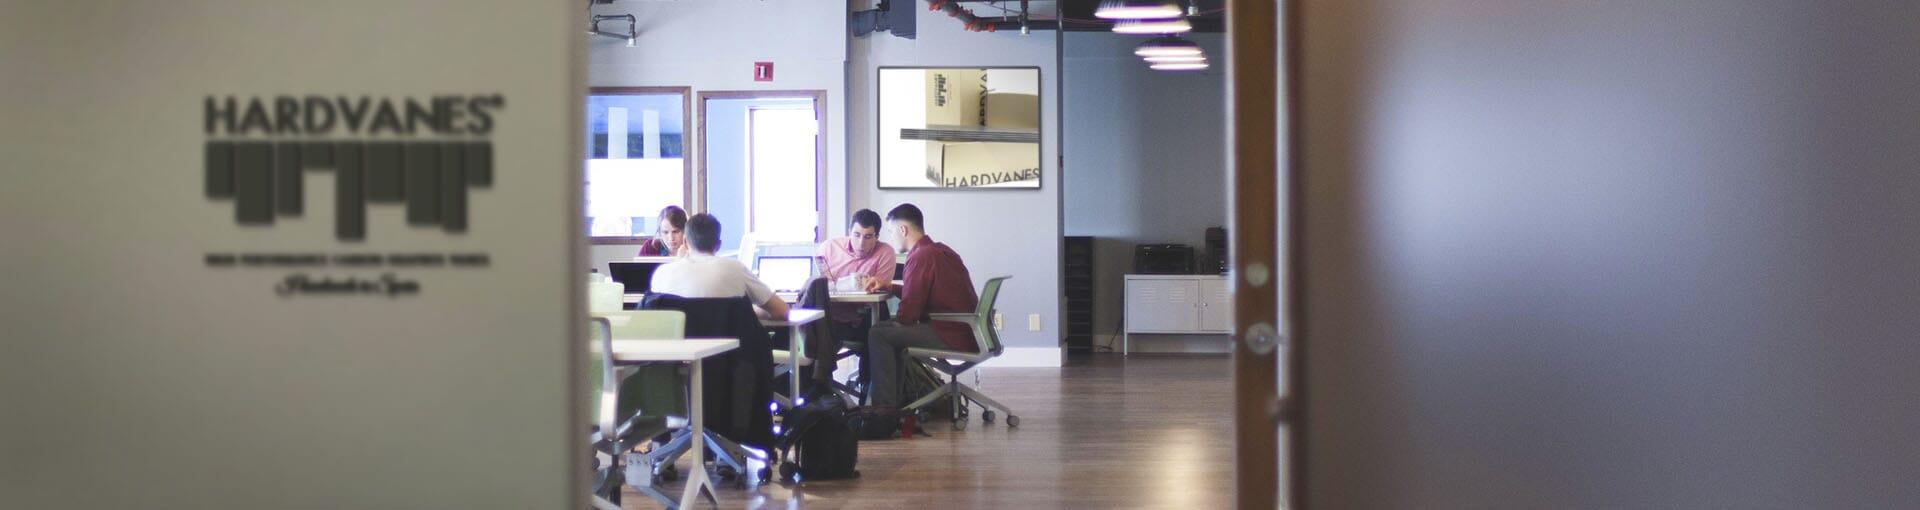 office vane-hardvanes-contact